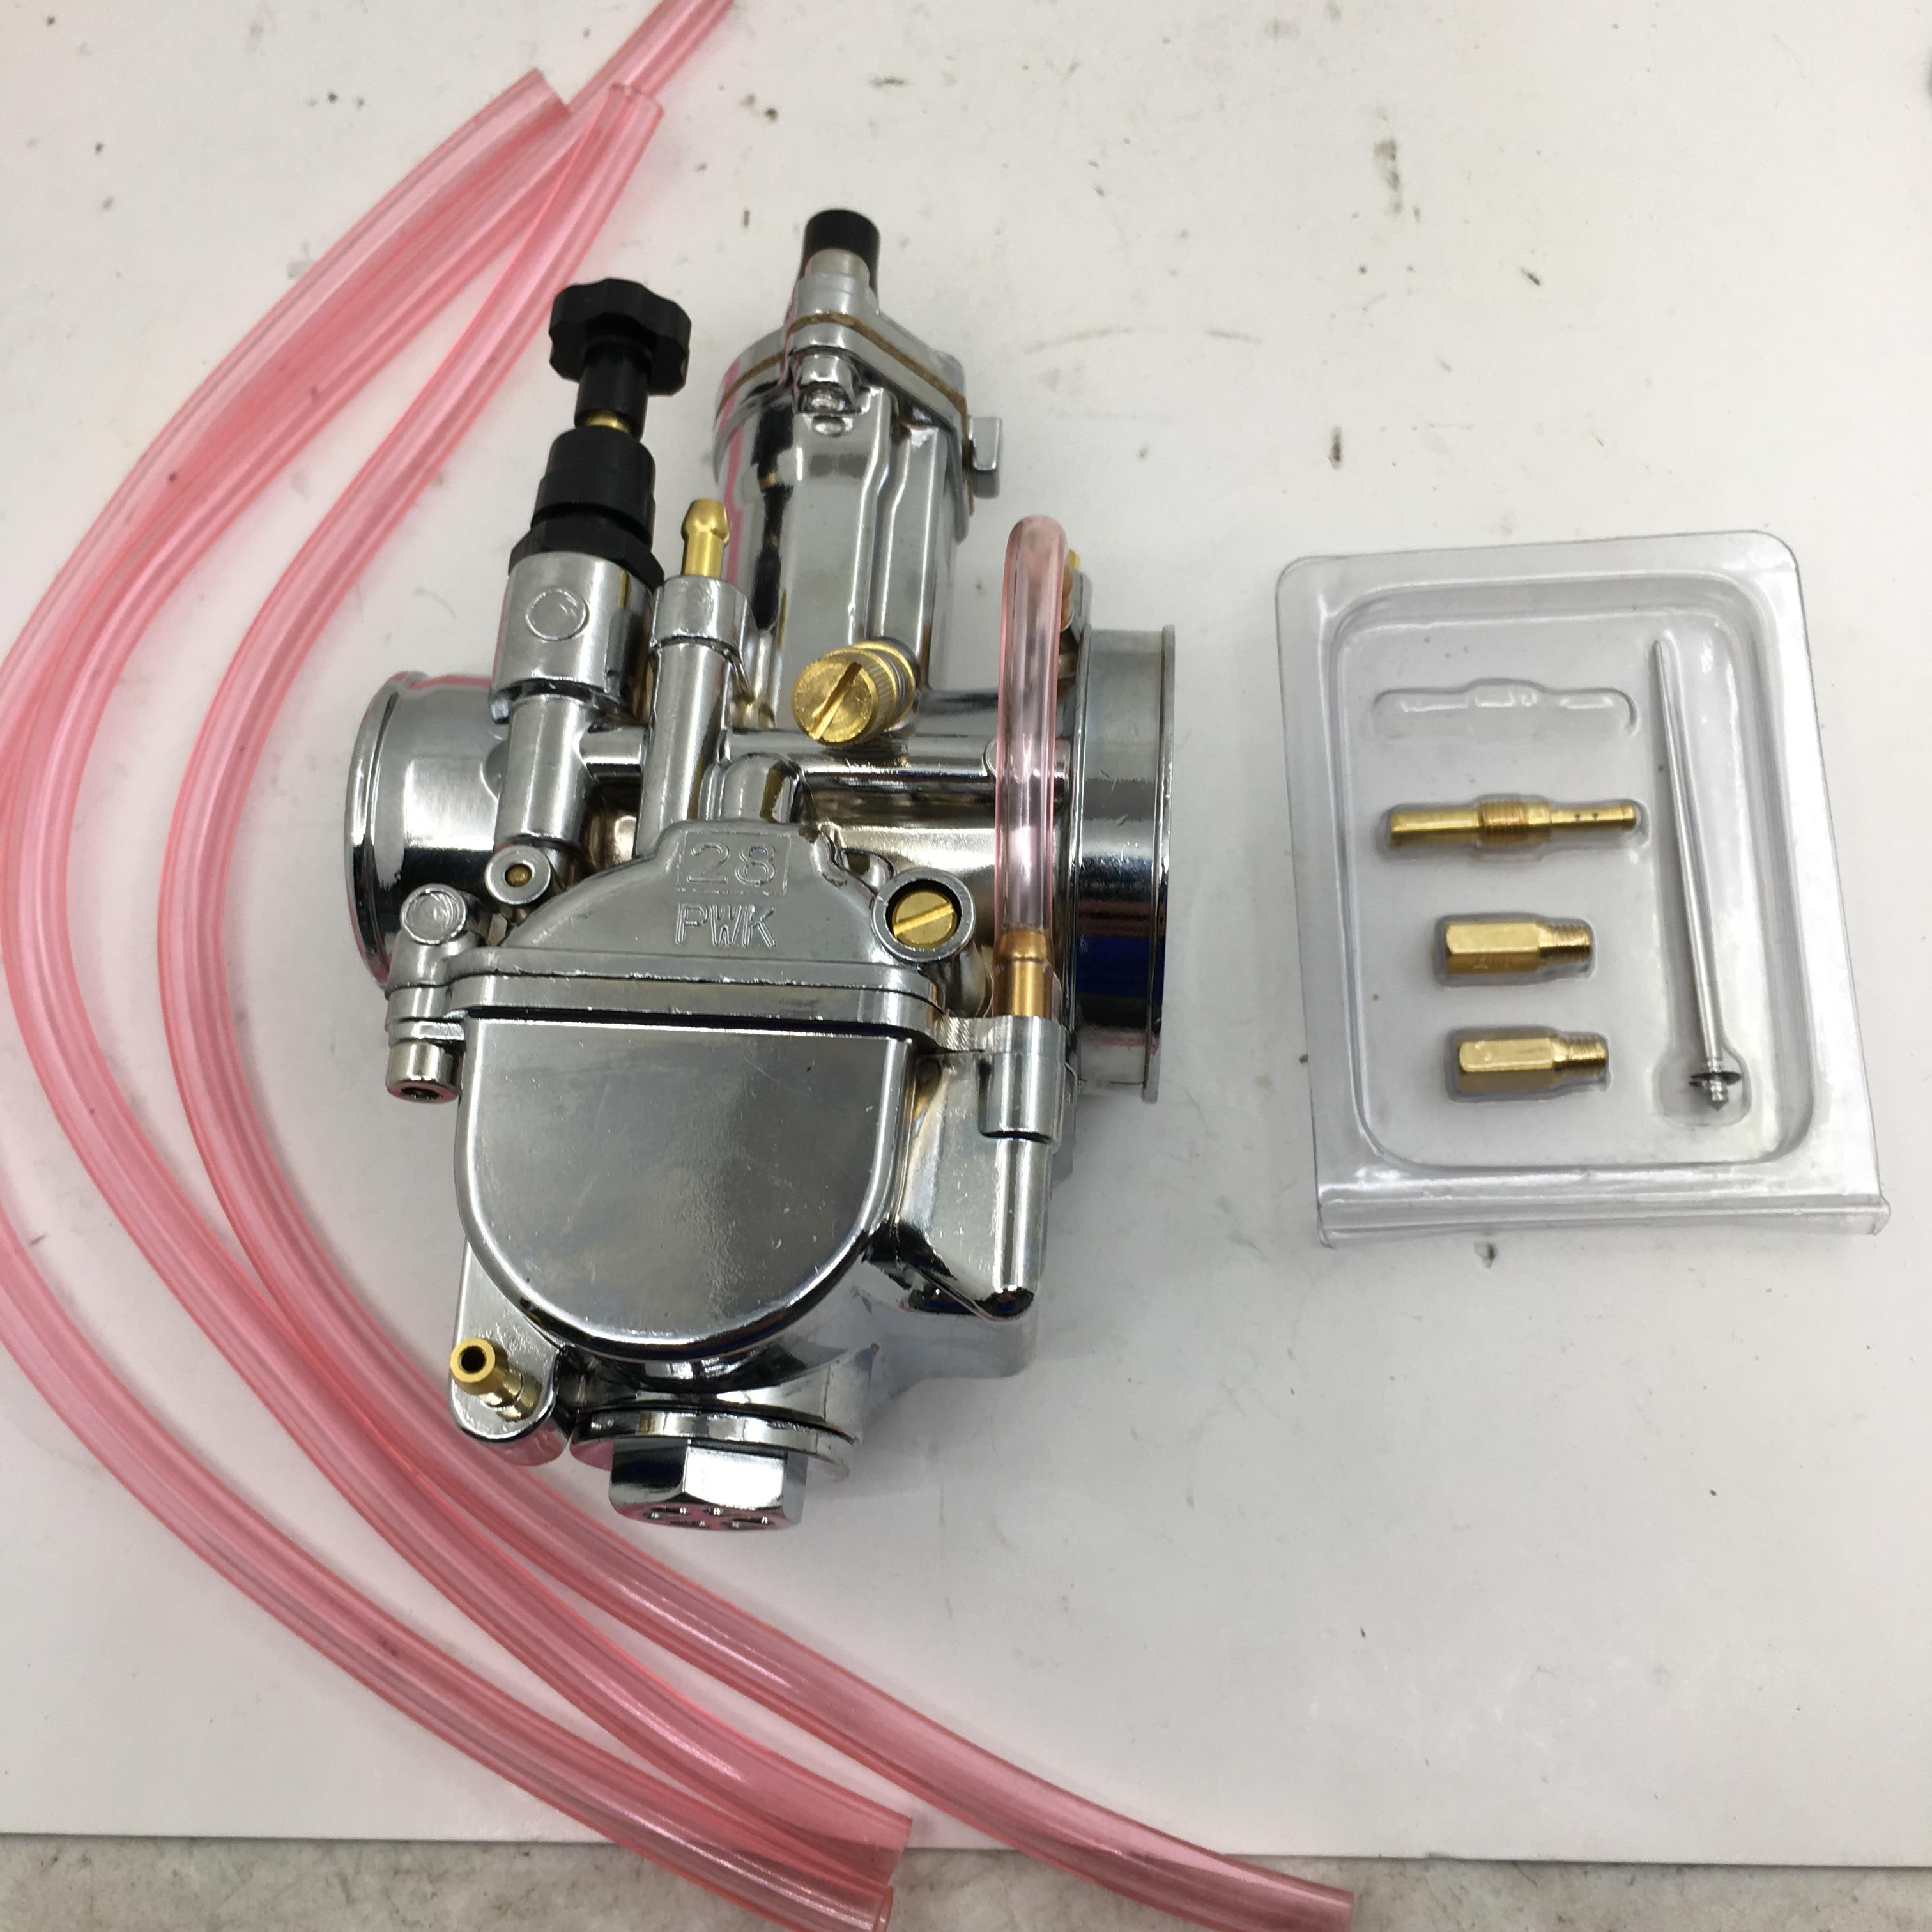 SherryBerg Chrome With Power Jet For Keihin 28 PWK PWK 28mm Flat Slide Carburetor For HONDA RTL250 CR80 CR85R CR125 NSR50 NSR80